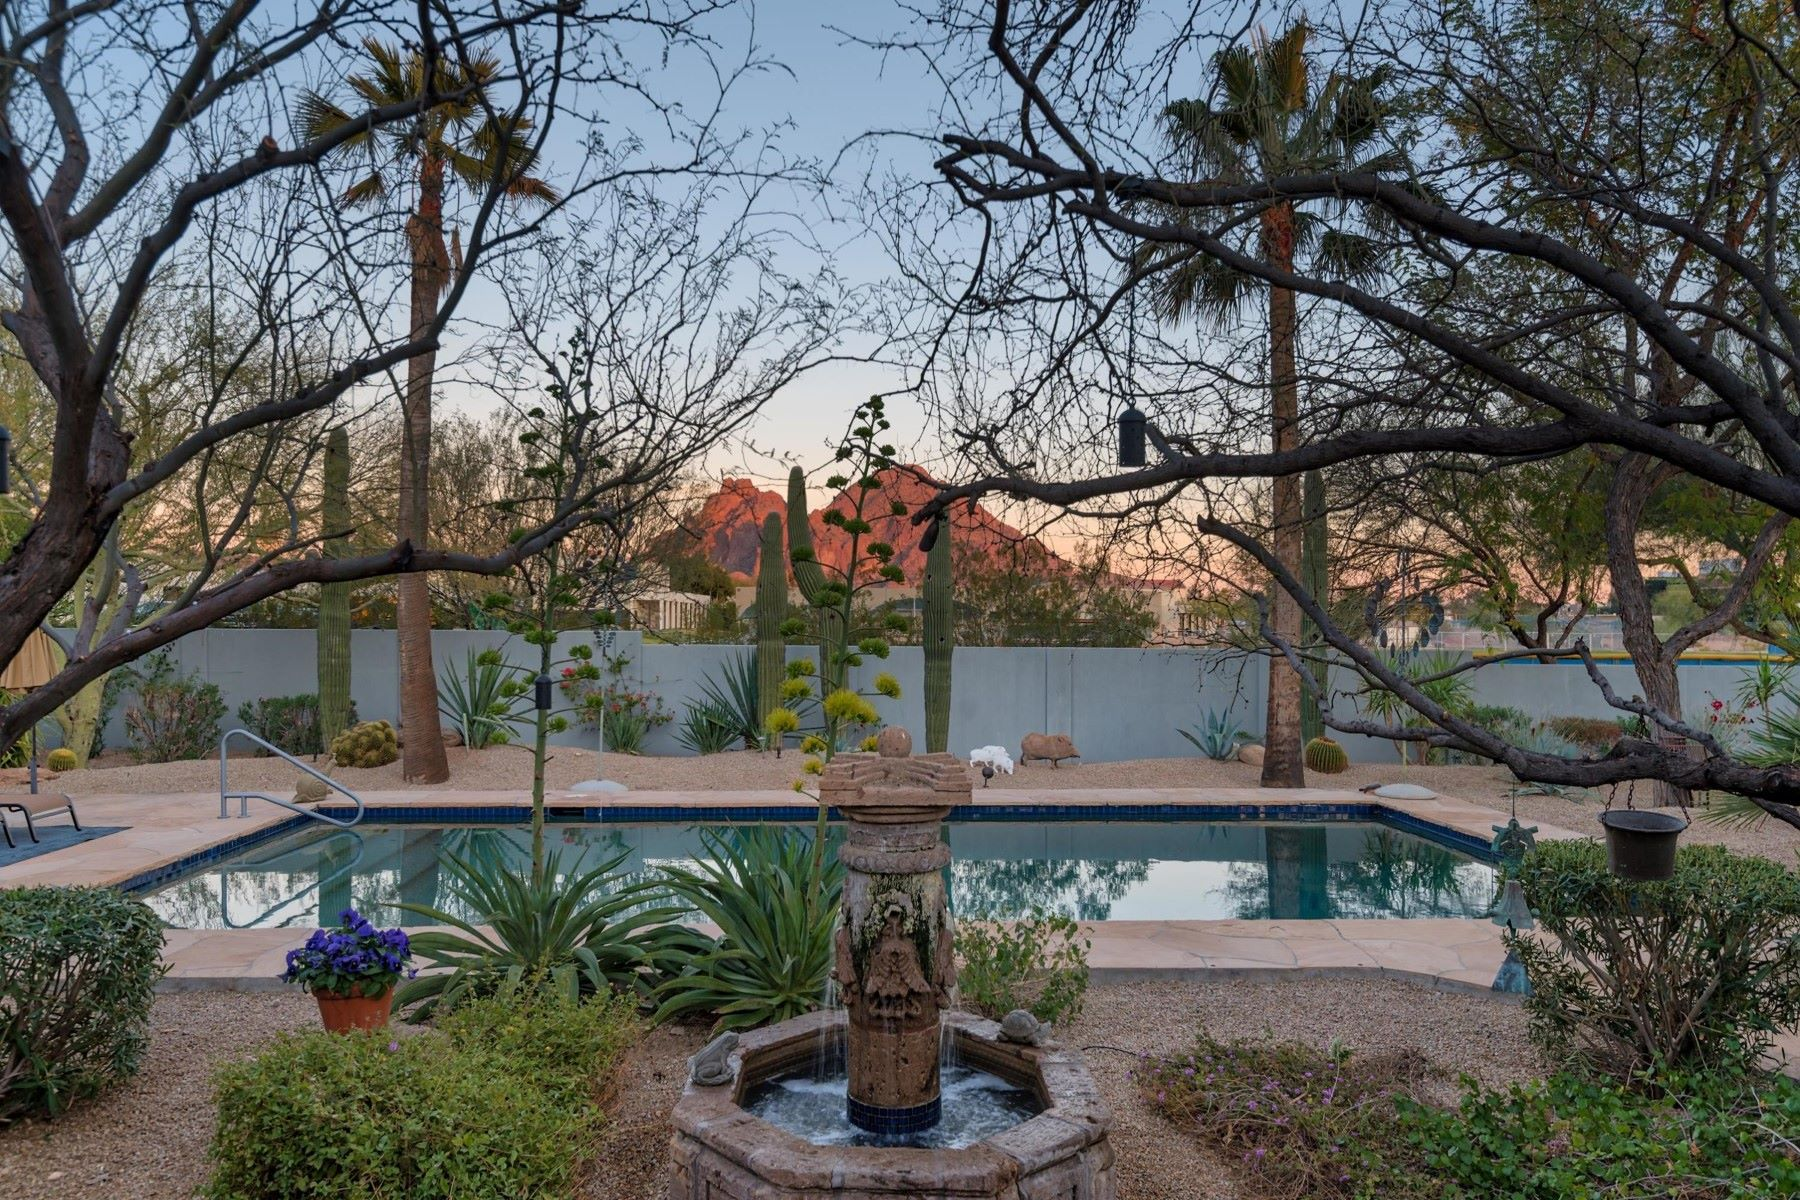 獨棟家庭住宅 為 出售 在 Fabulous Rustic Home in White Estates 5311 N 37TH PLACE, Paradise Valley, 亞利桑那州, 85253 美國